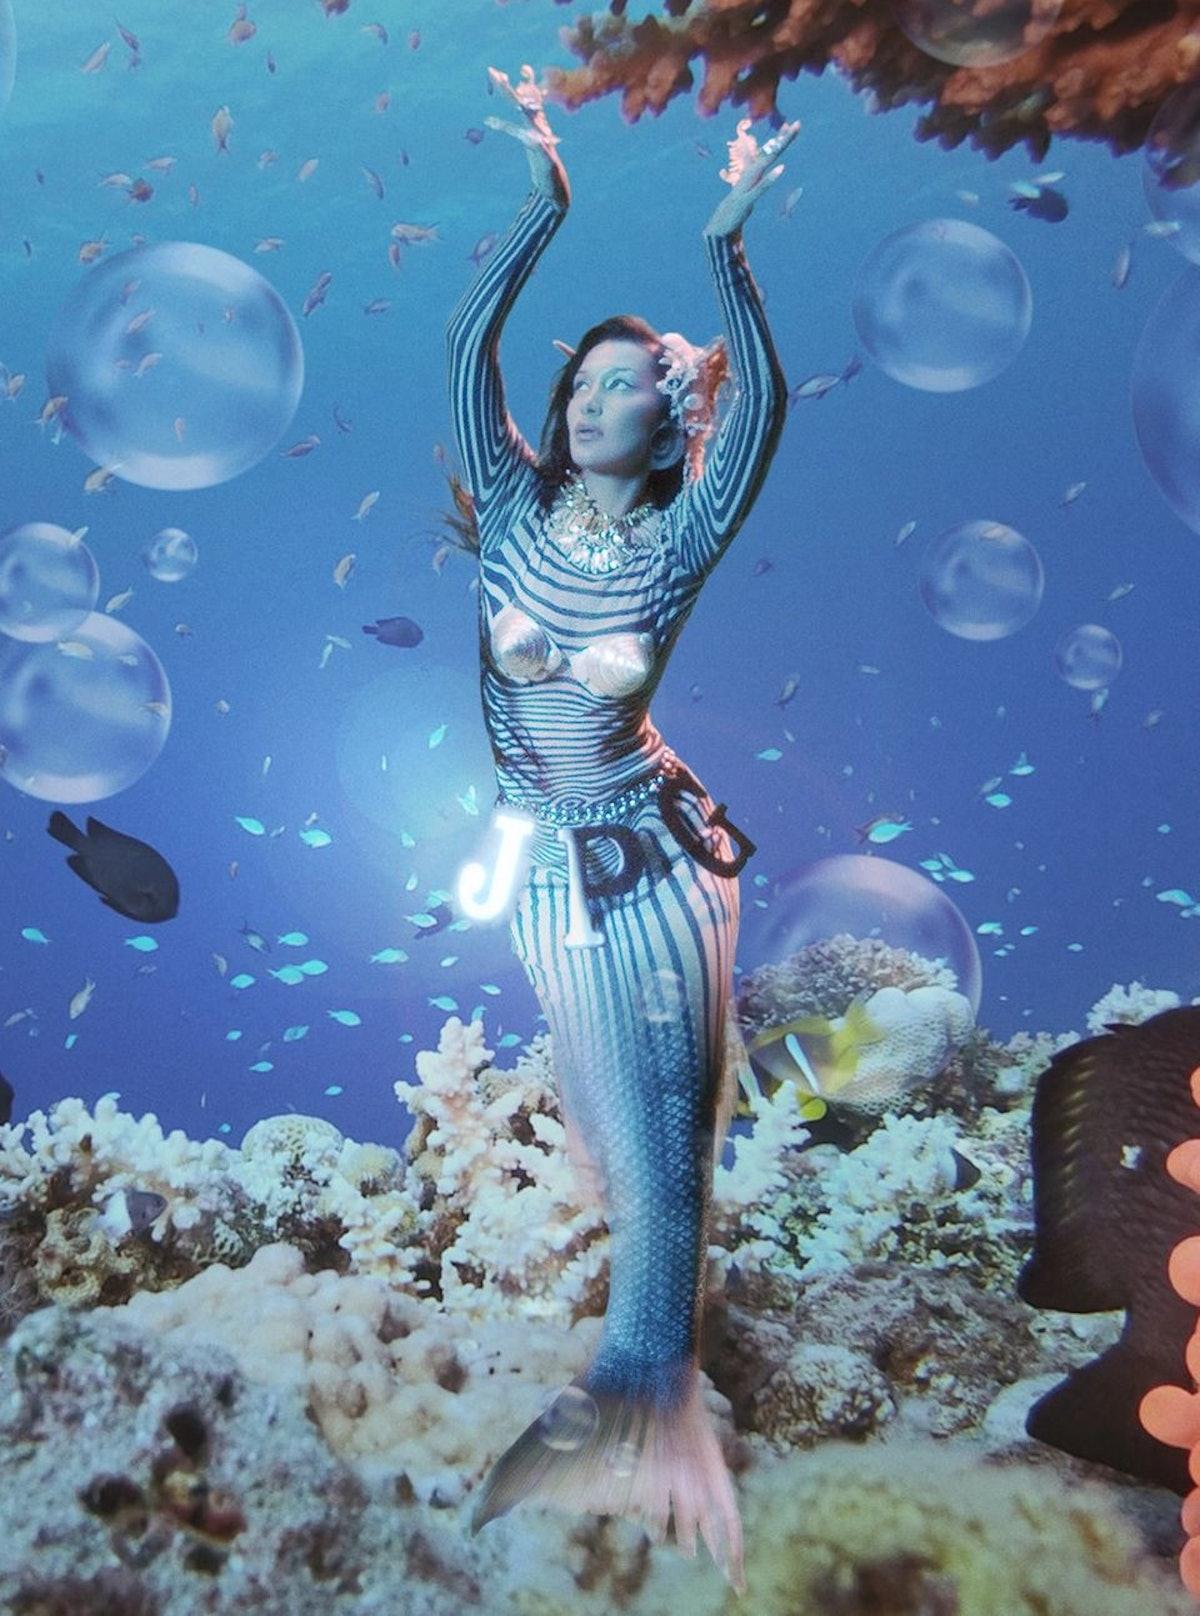 Bella Hadid as a mermaid